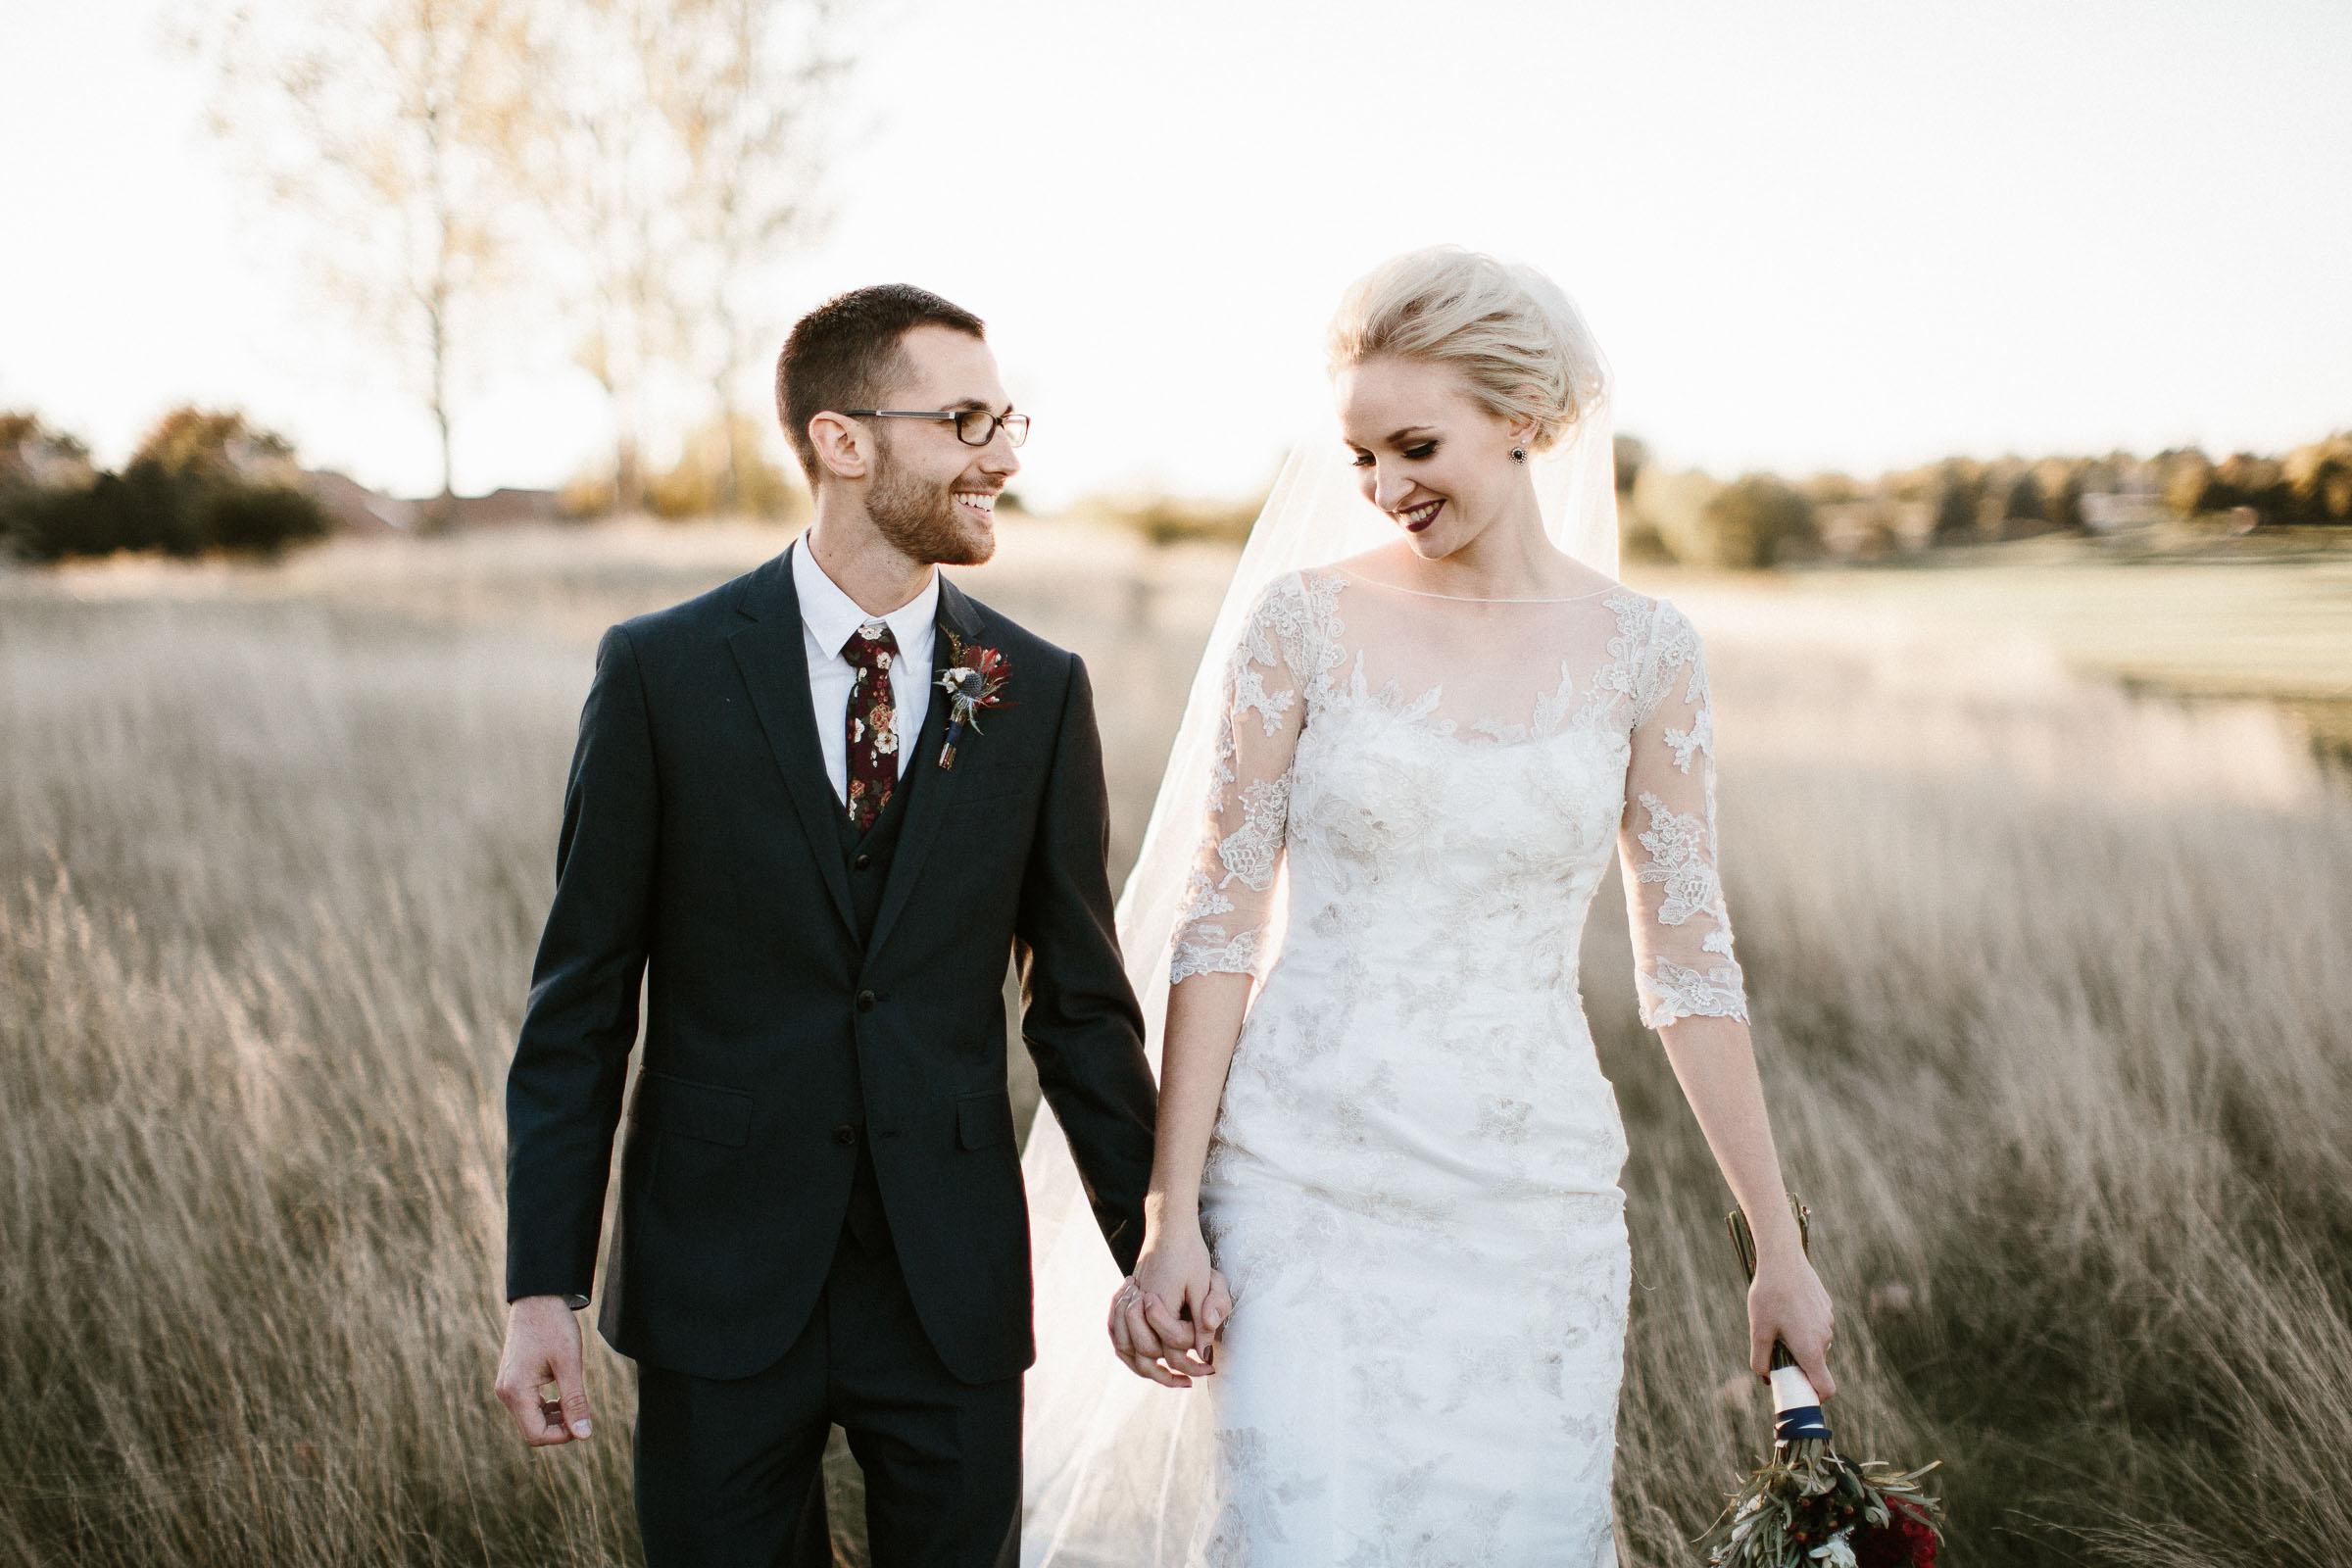 Jenna&Austin_SiouxFalls_Wedding_Photographer_093.jpg